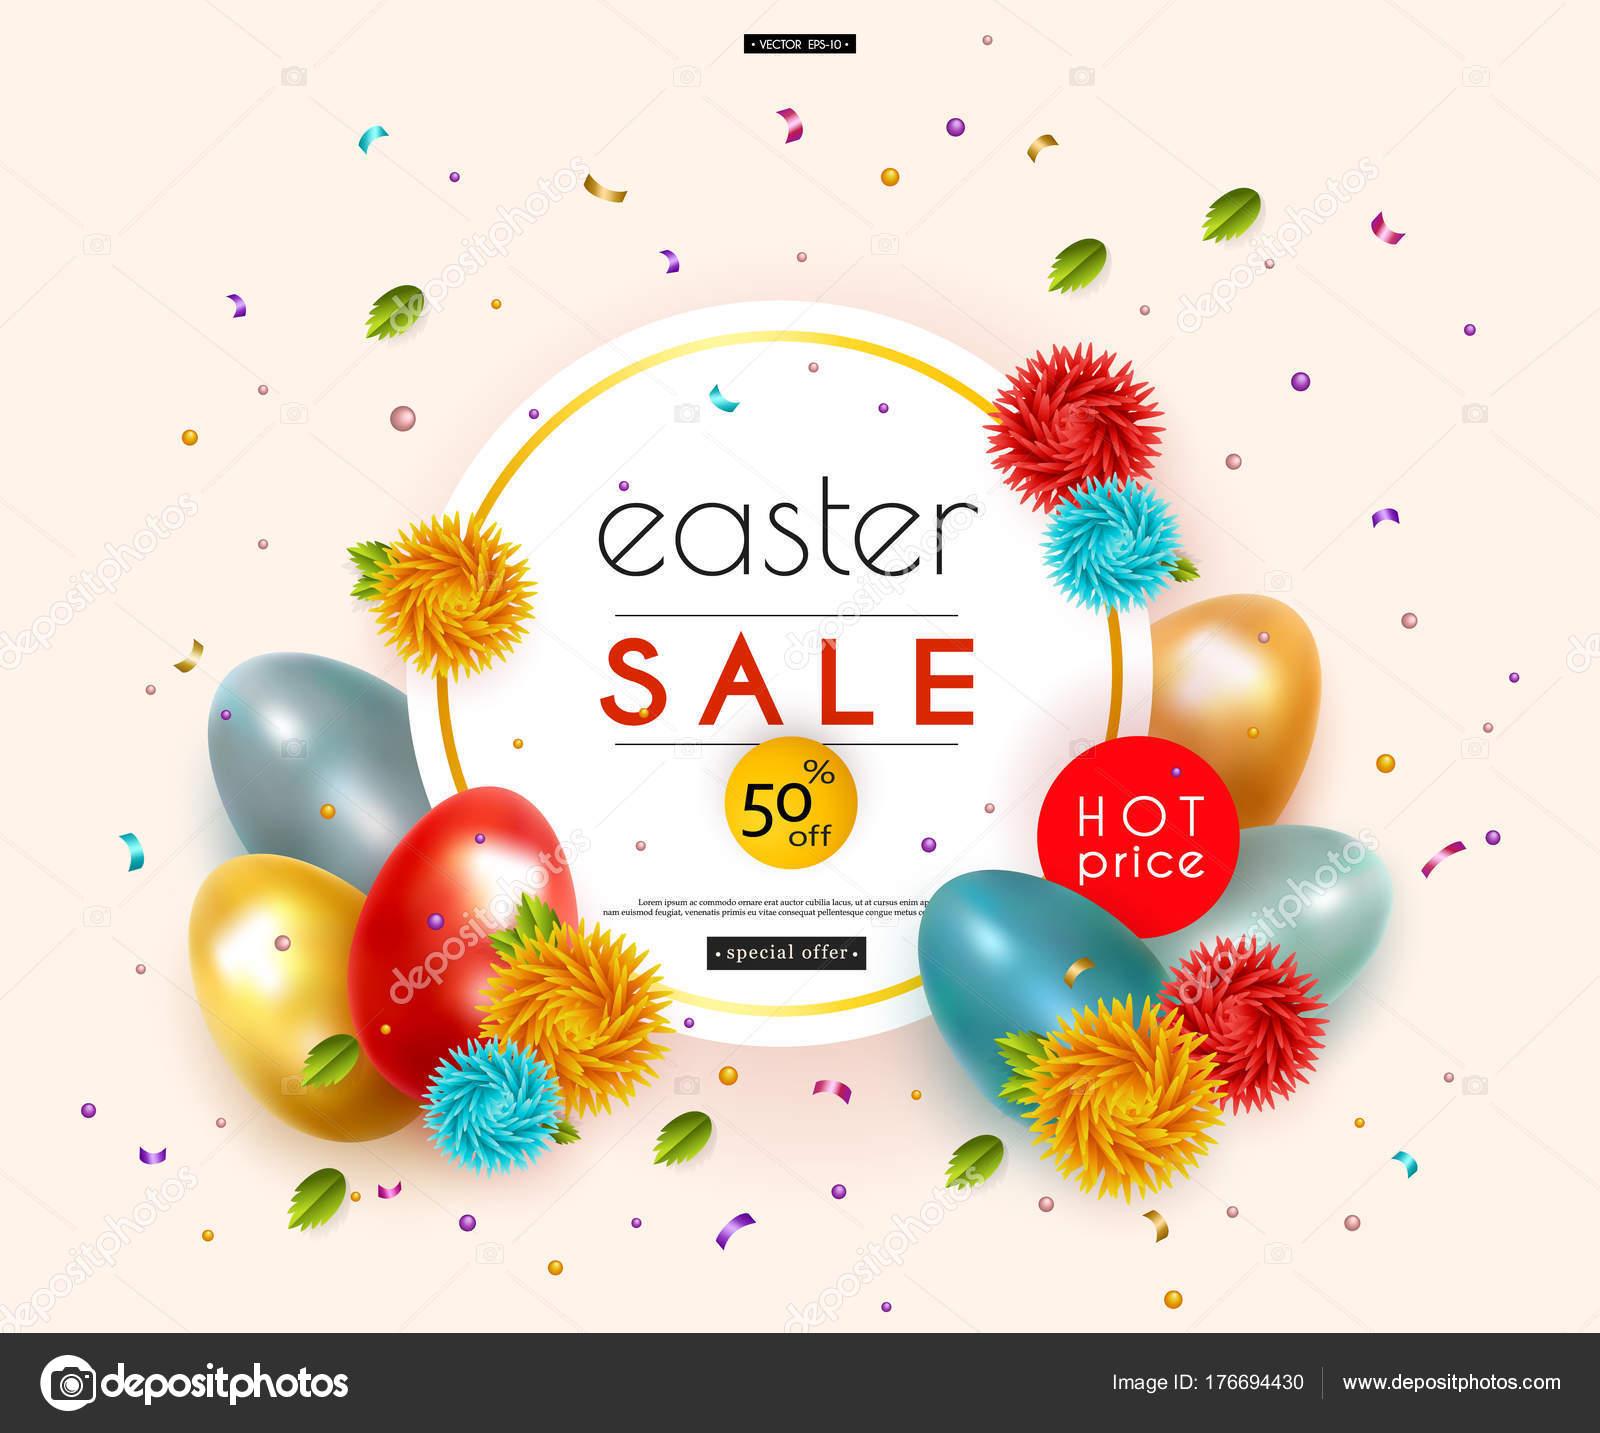 3662eee07a Πασχαλινή προσφορά. Διαφήμιση banner με κοτόπουλο και τα αυγά ορτυκιού